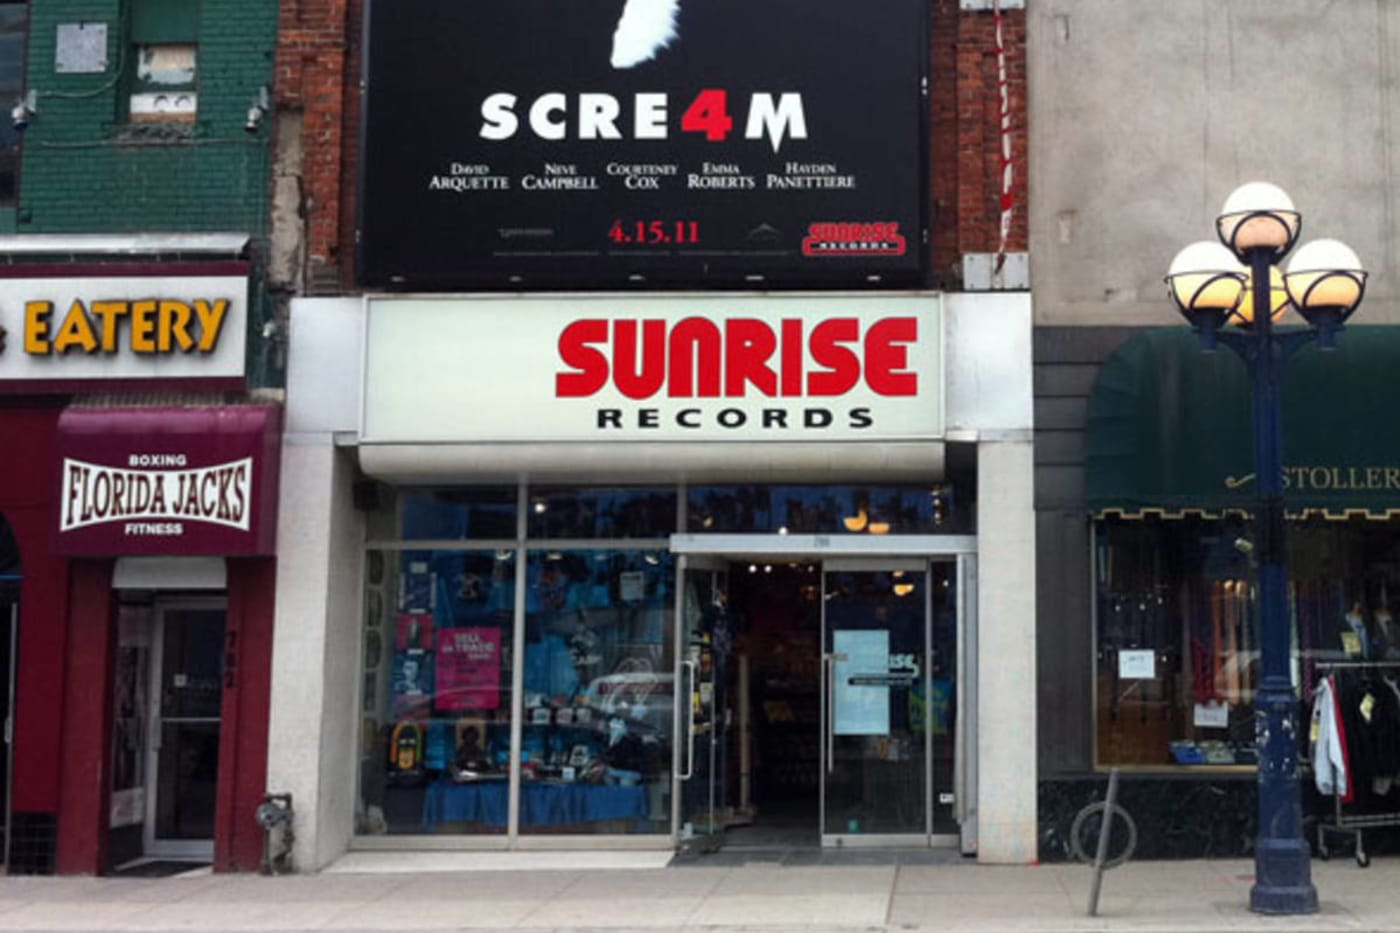 Sunrise Records Replace 70 HMV Stores